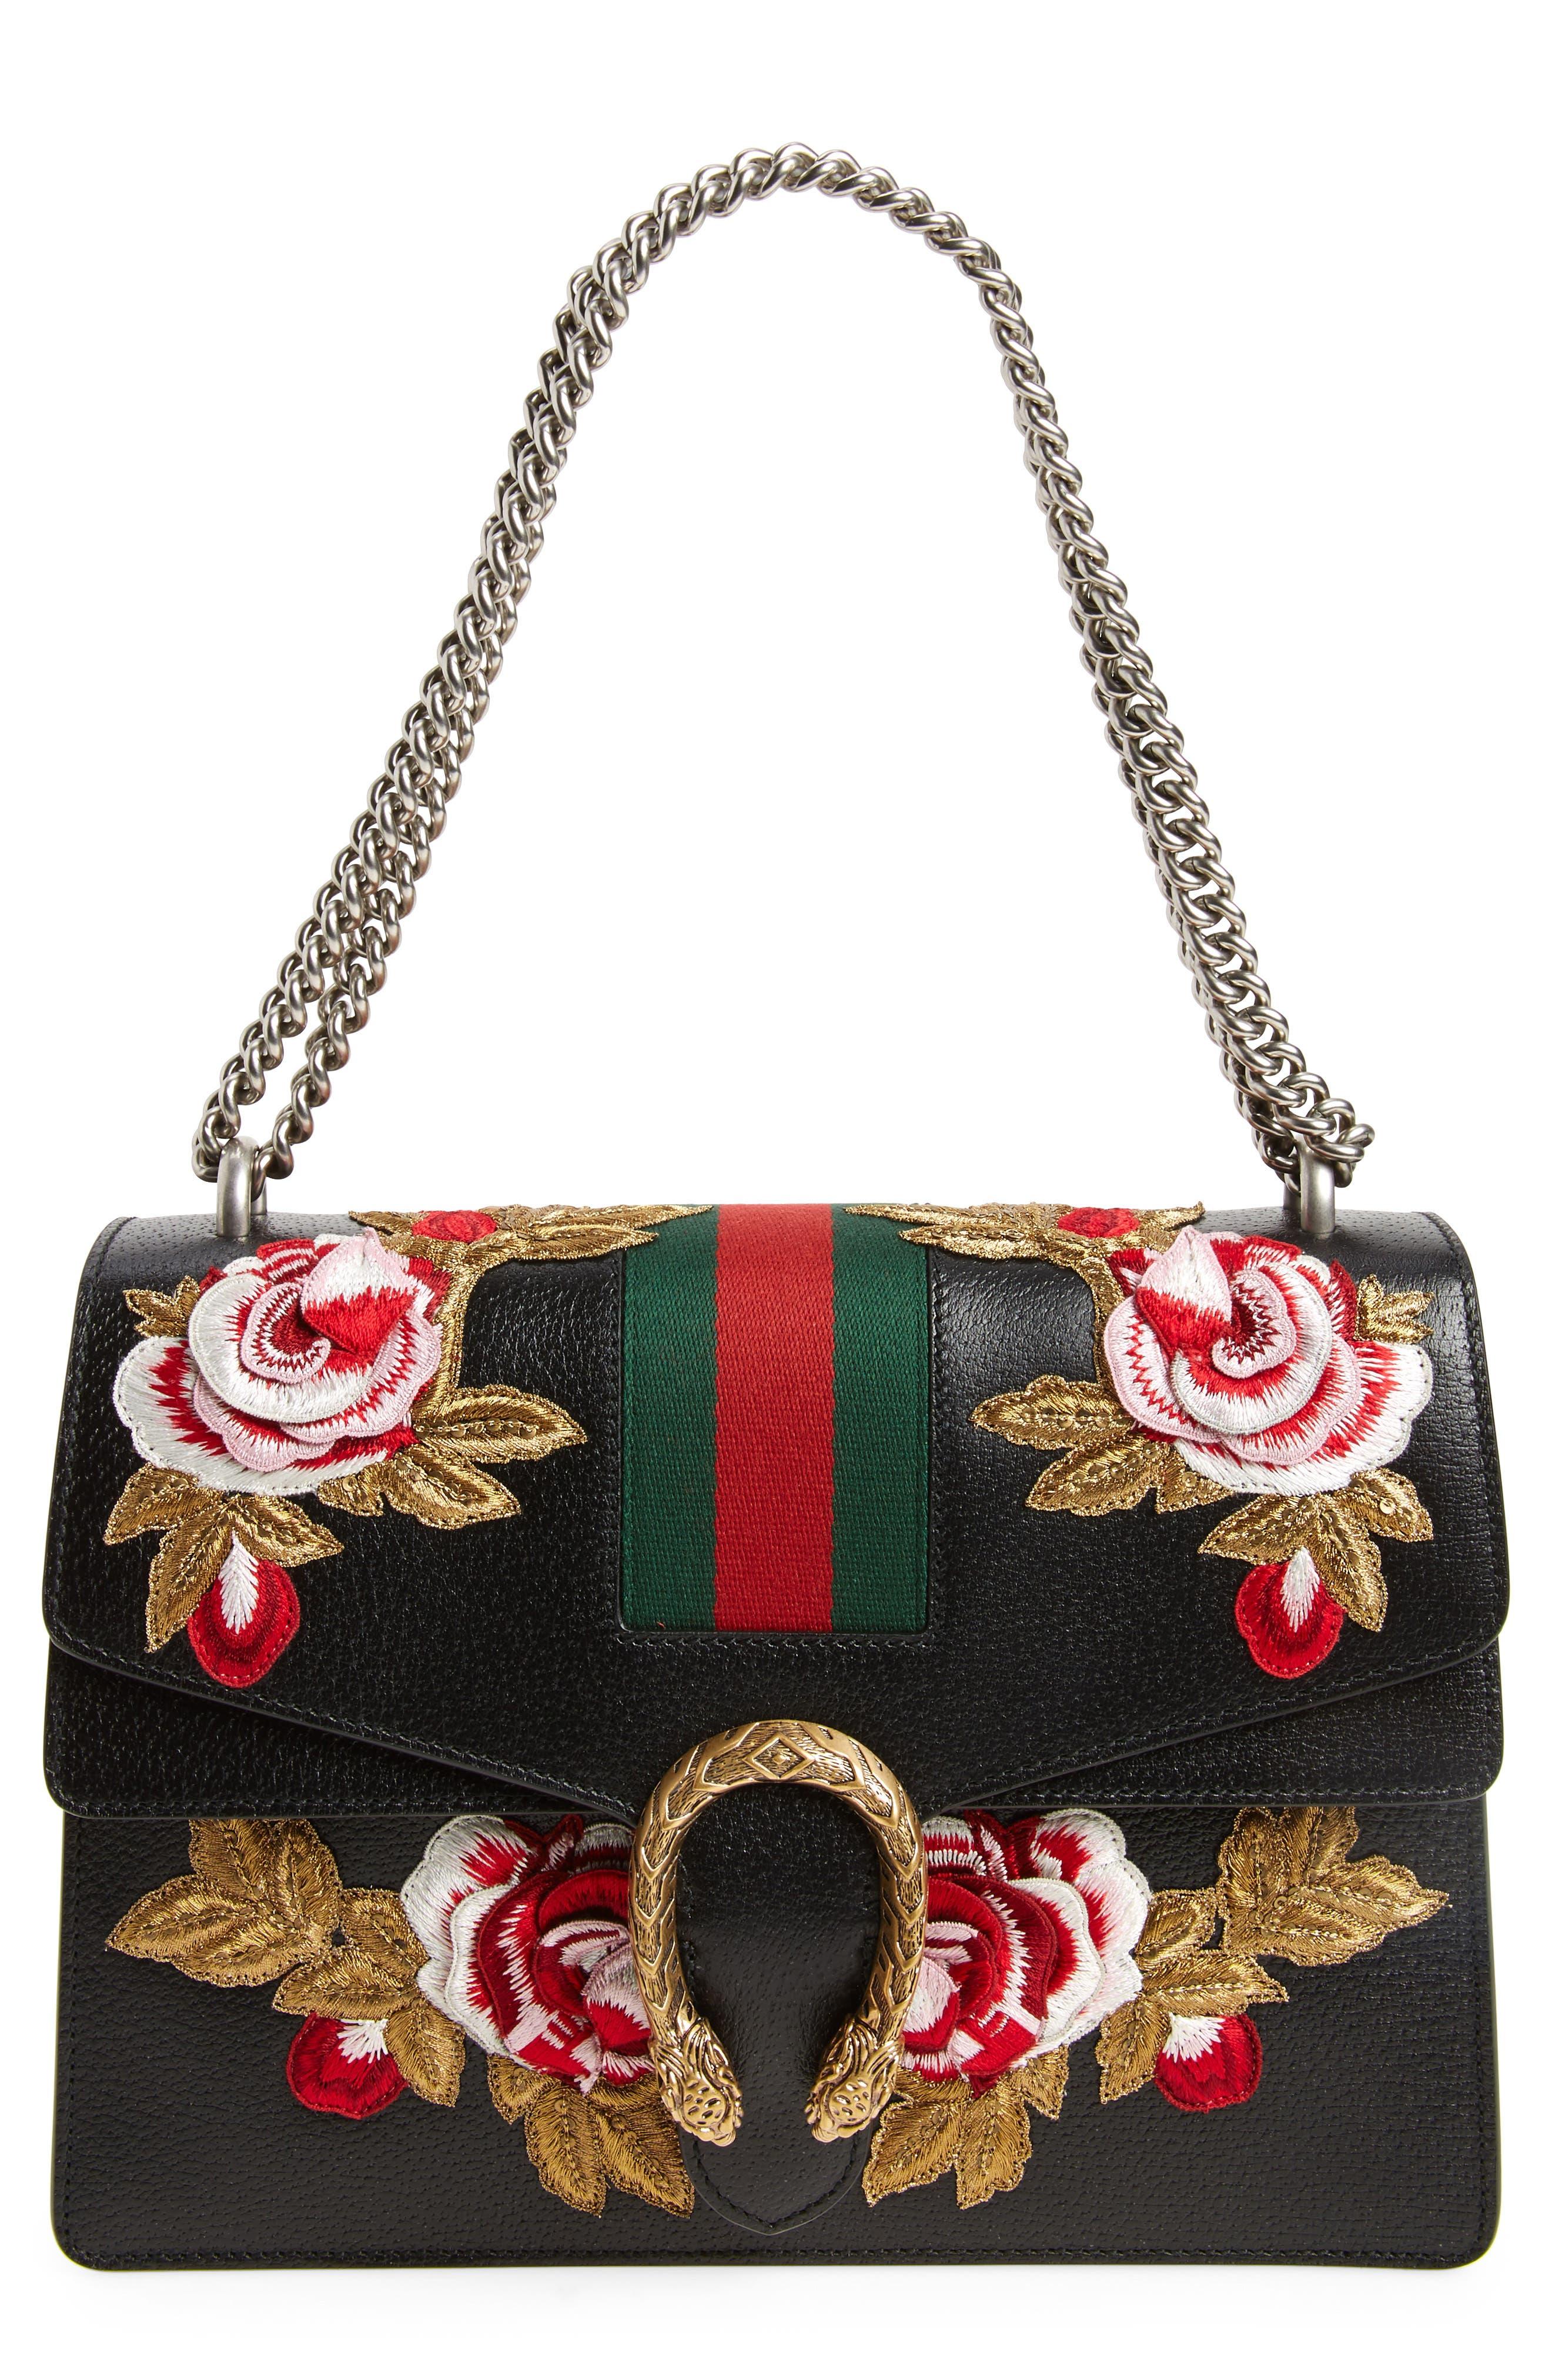 Medium Dionysus Embroidered Roses Leather Shoulder Bag,                         Main,                         color, 977